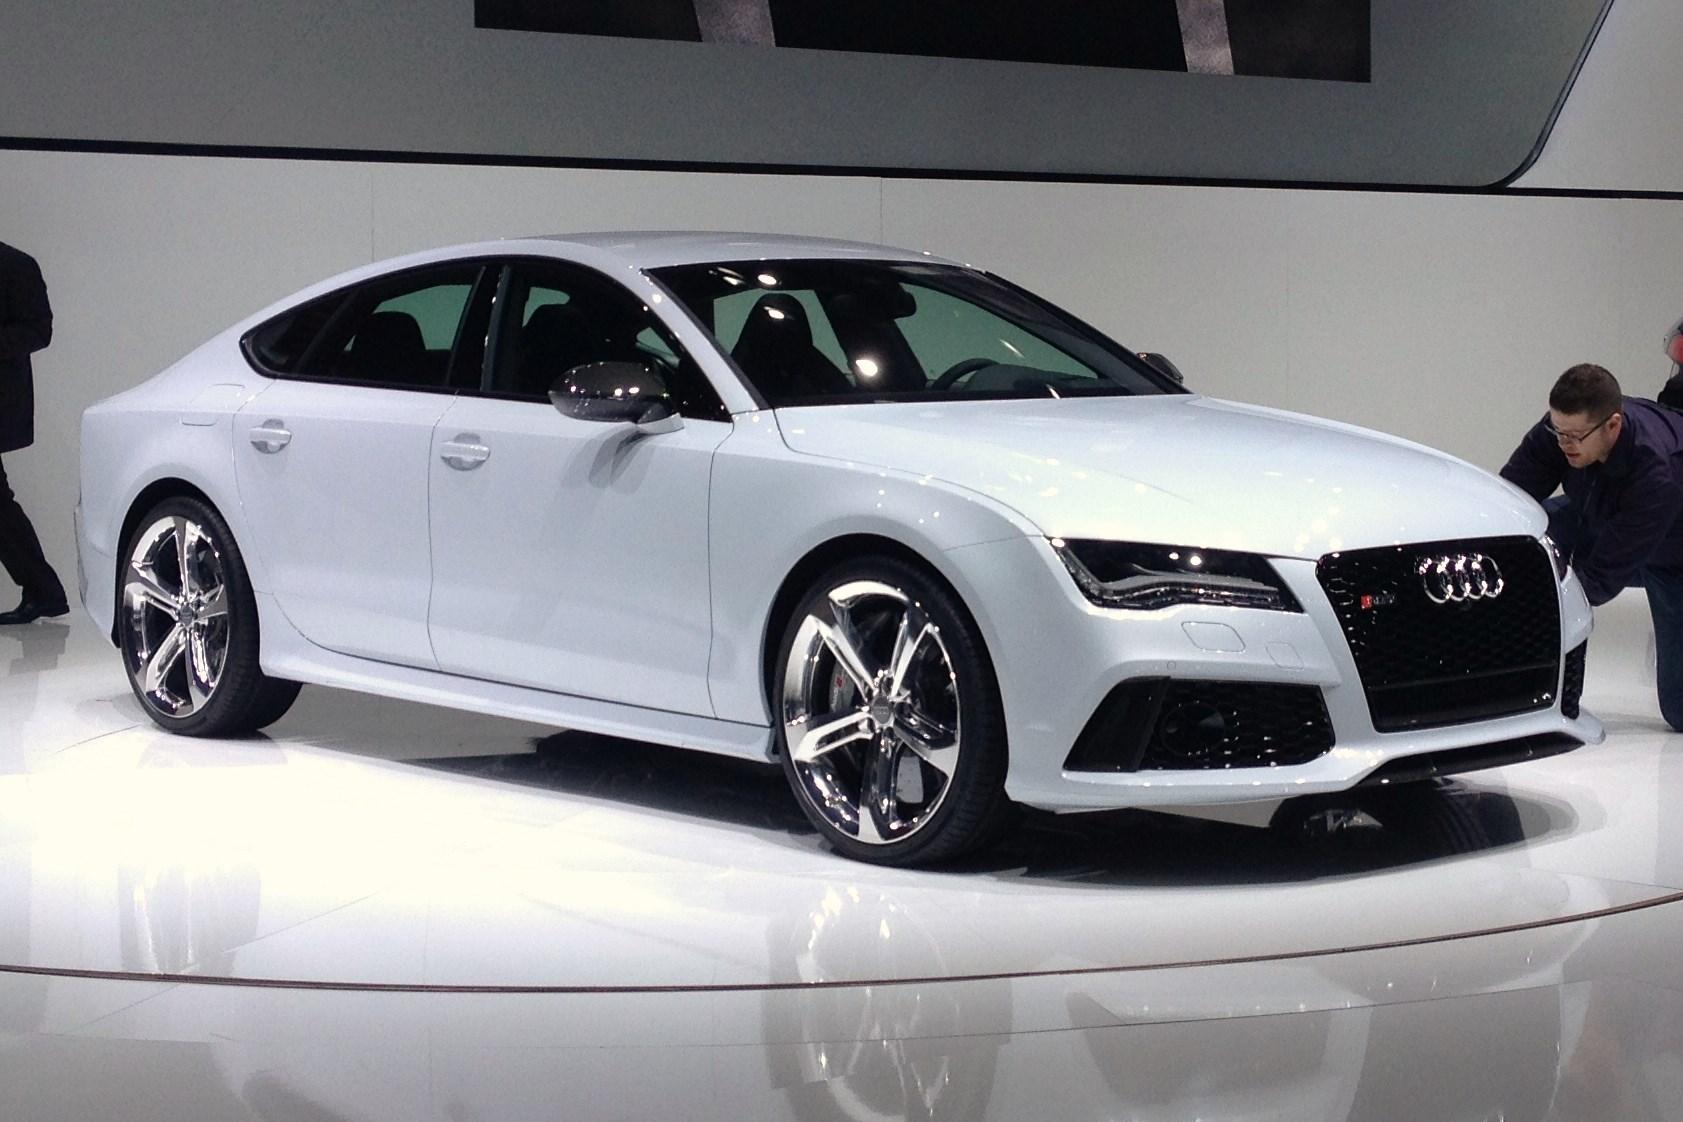 Audi vehicle A7